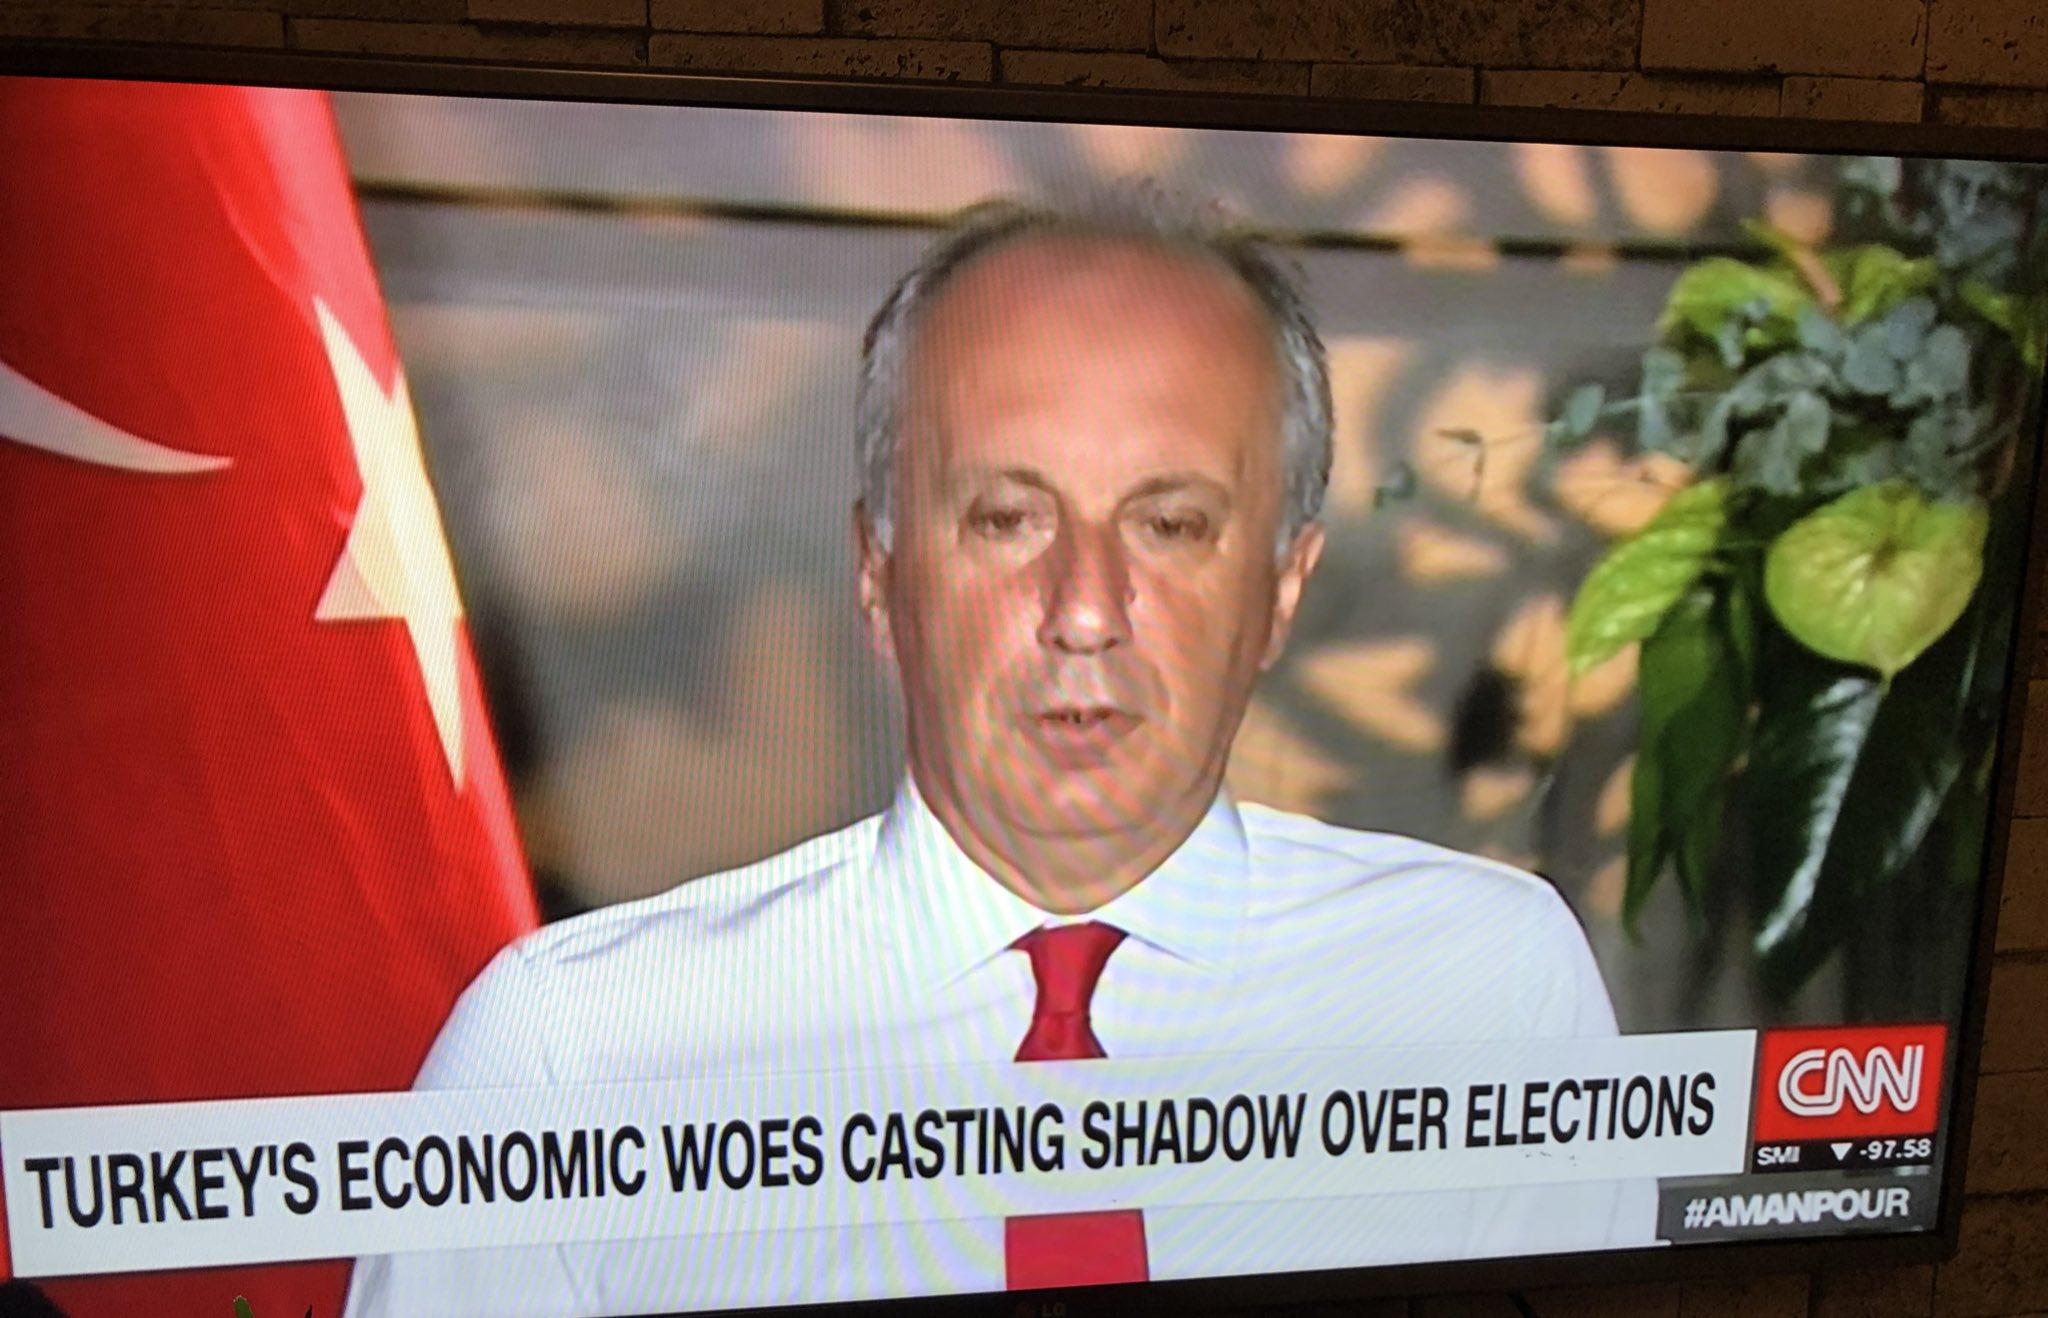 CNN Türk susuyor, CNN International yayınlıyor https://t.co/DqhI4vqq5C